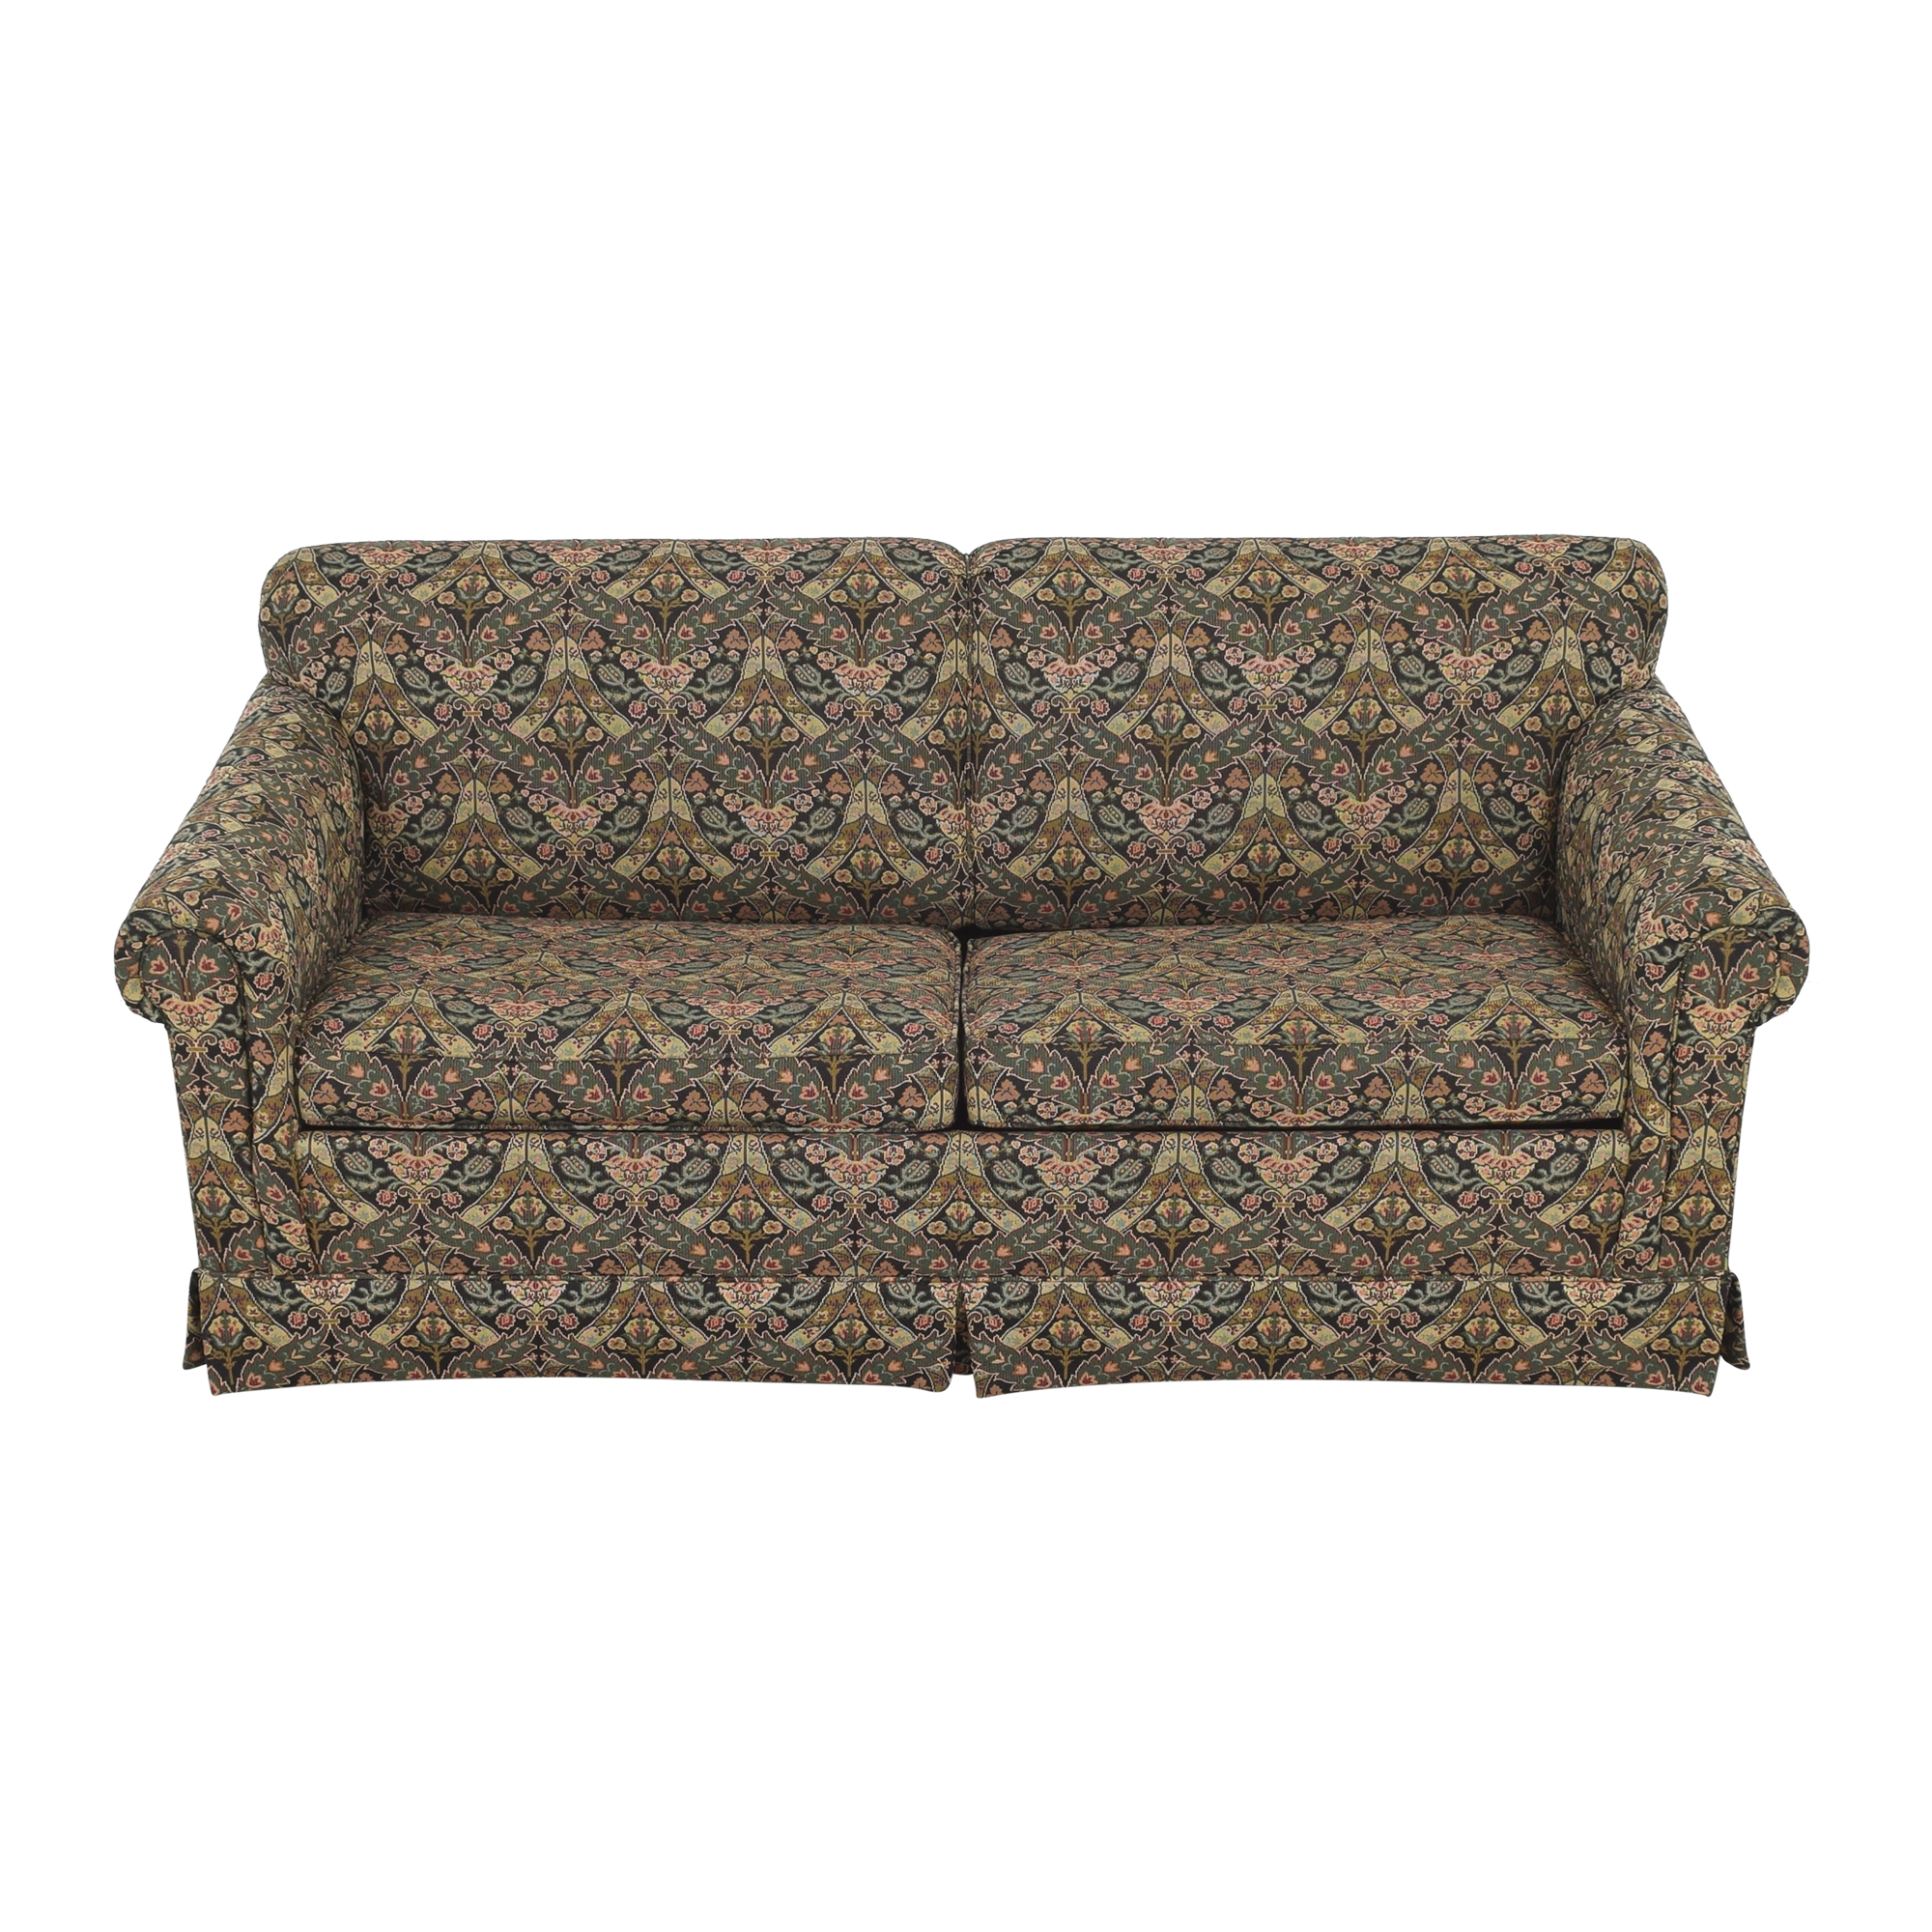 Ethan Allen Full Sleeper Sofa / Sofa Beds